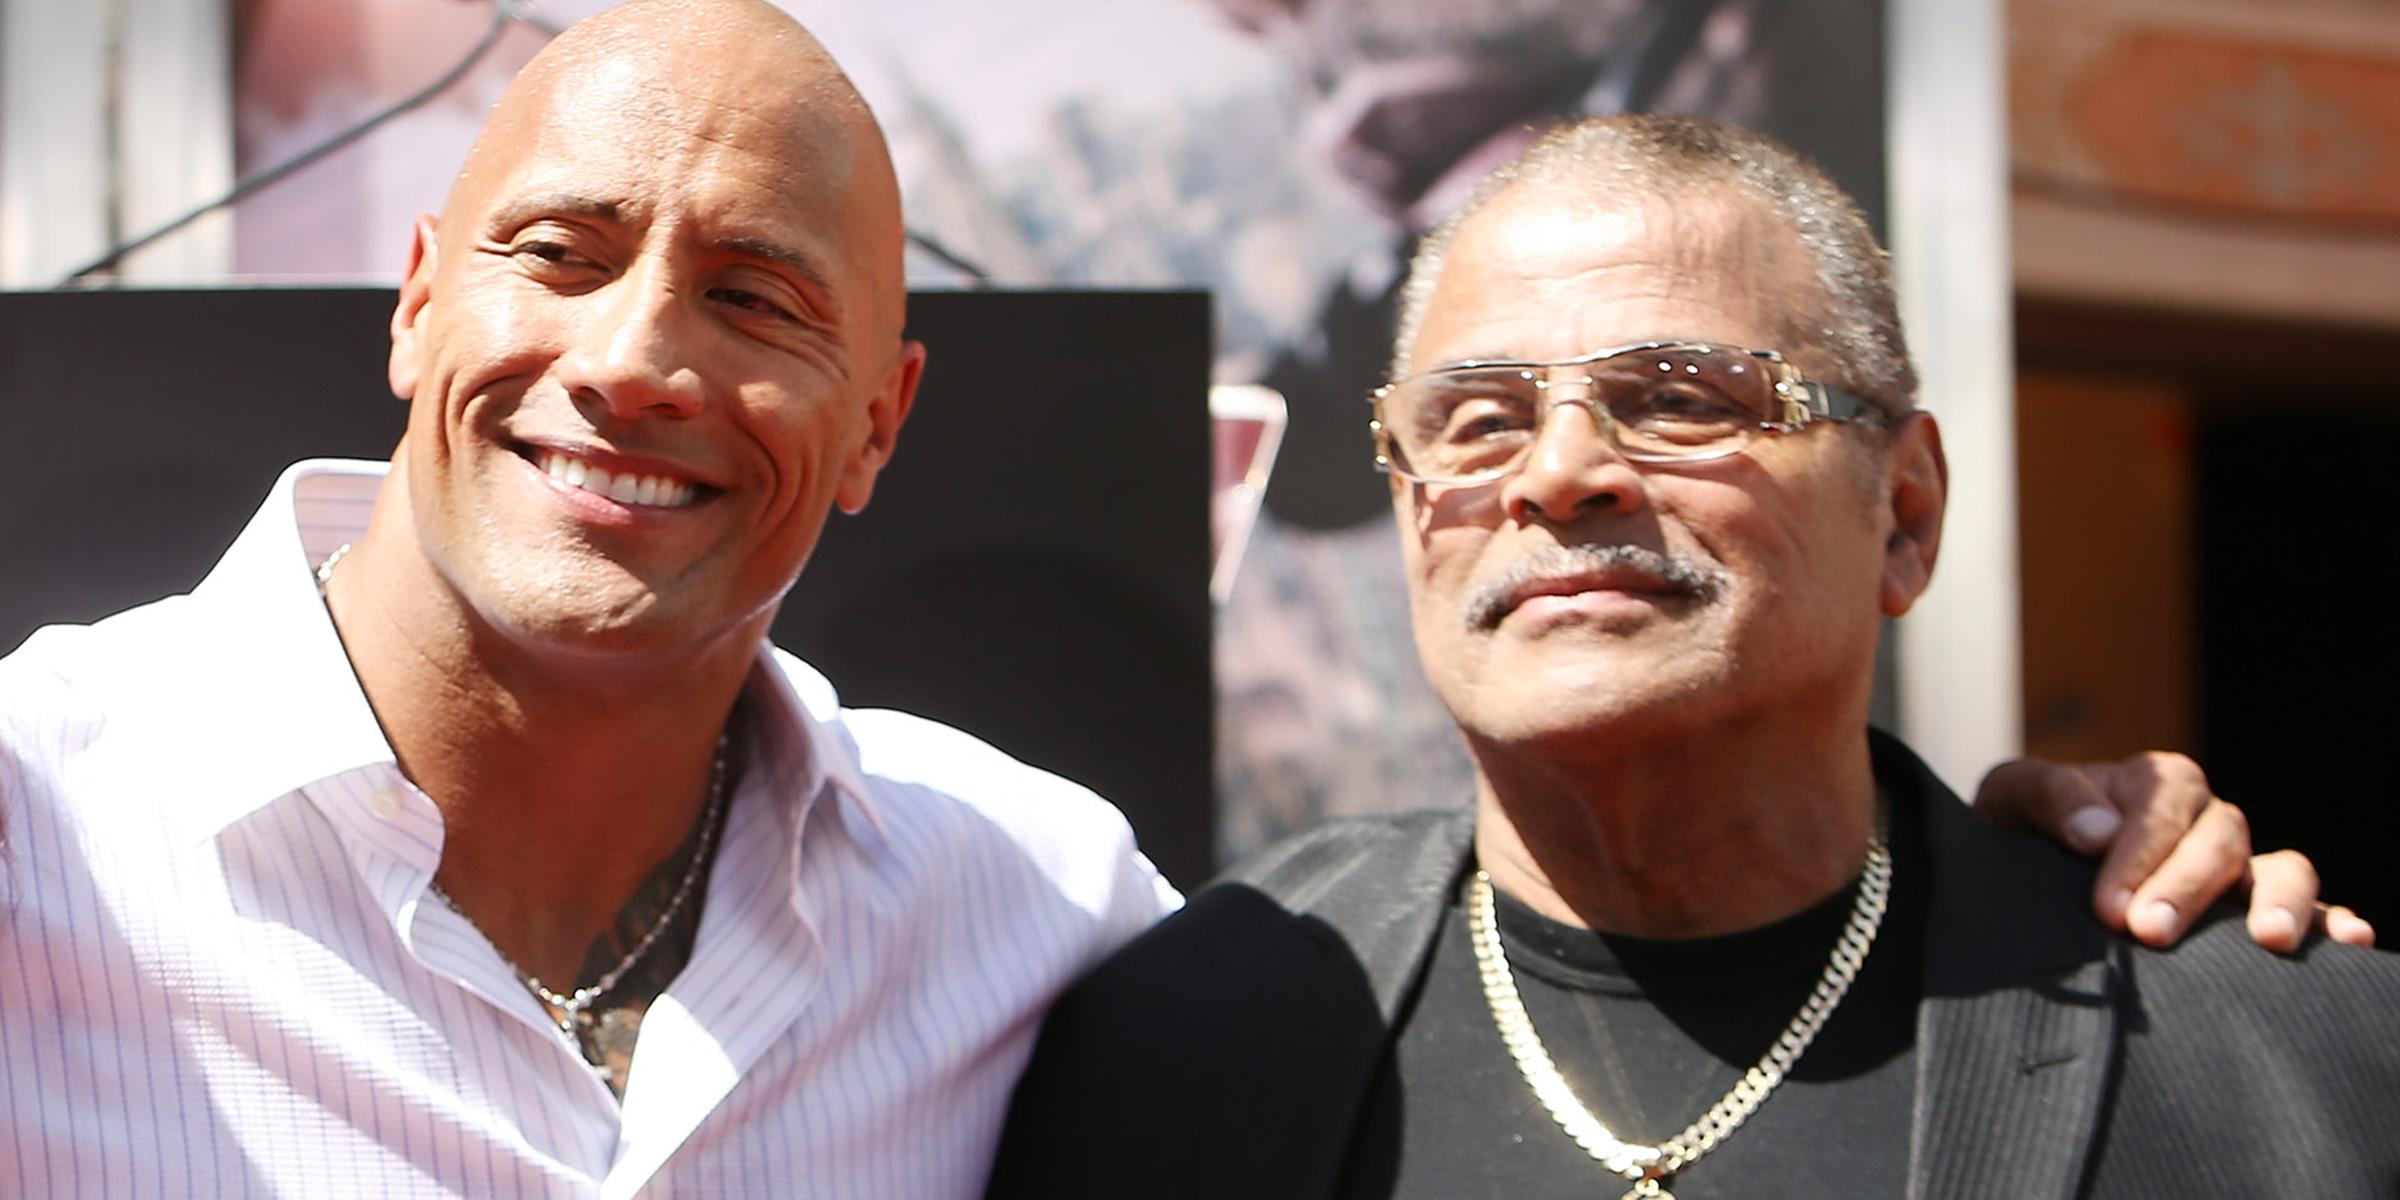 Dwayne Johnson reveals dad Rocky Johnson's cause of death